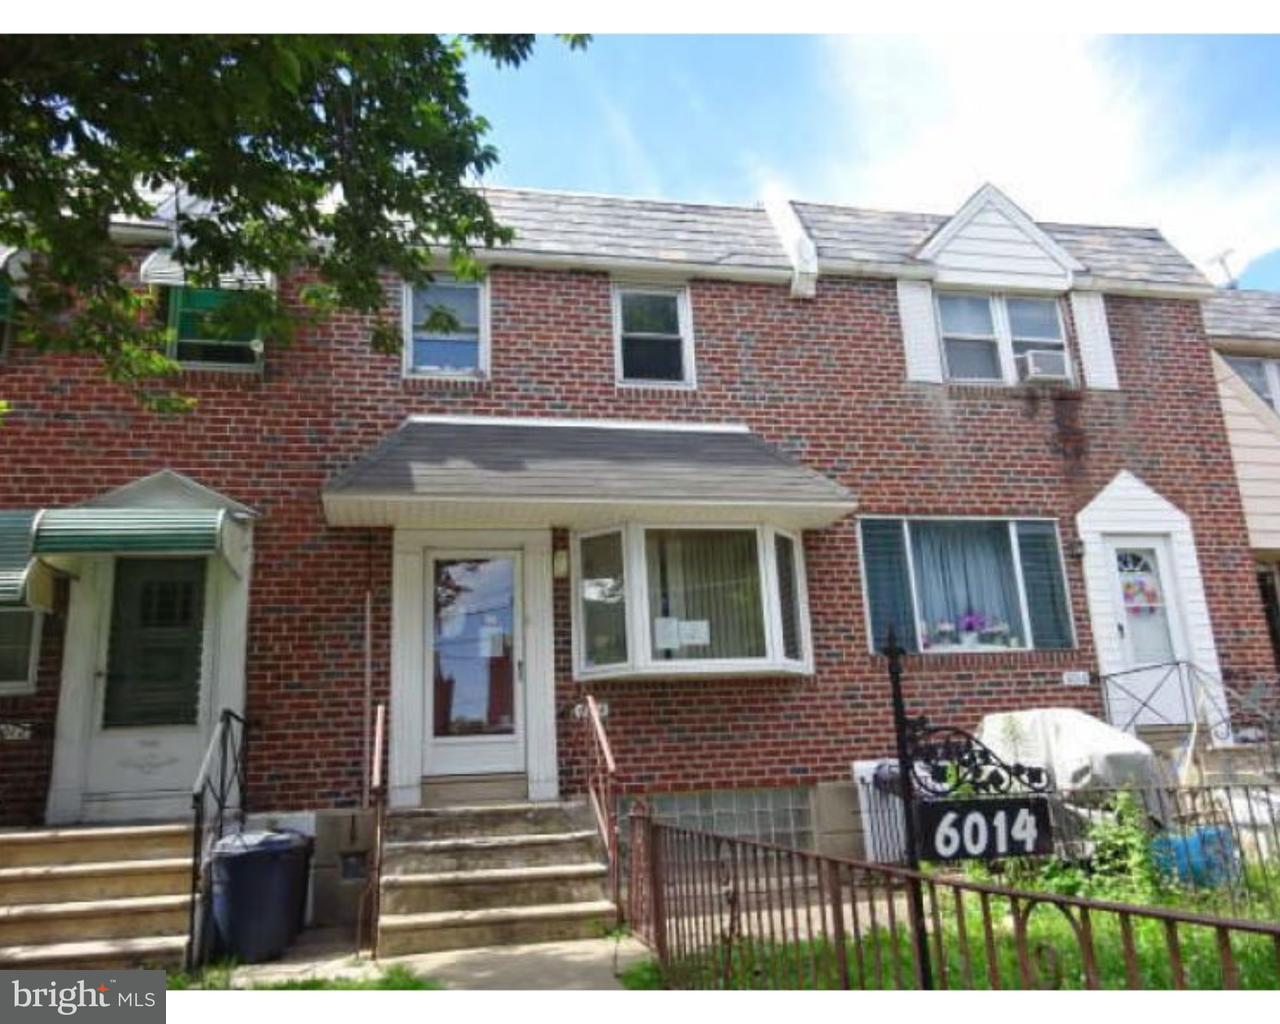 6014 Tulip Street Philadelphia, PA 19135